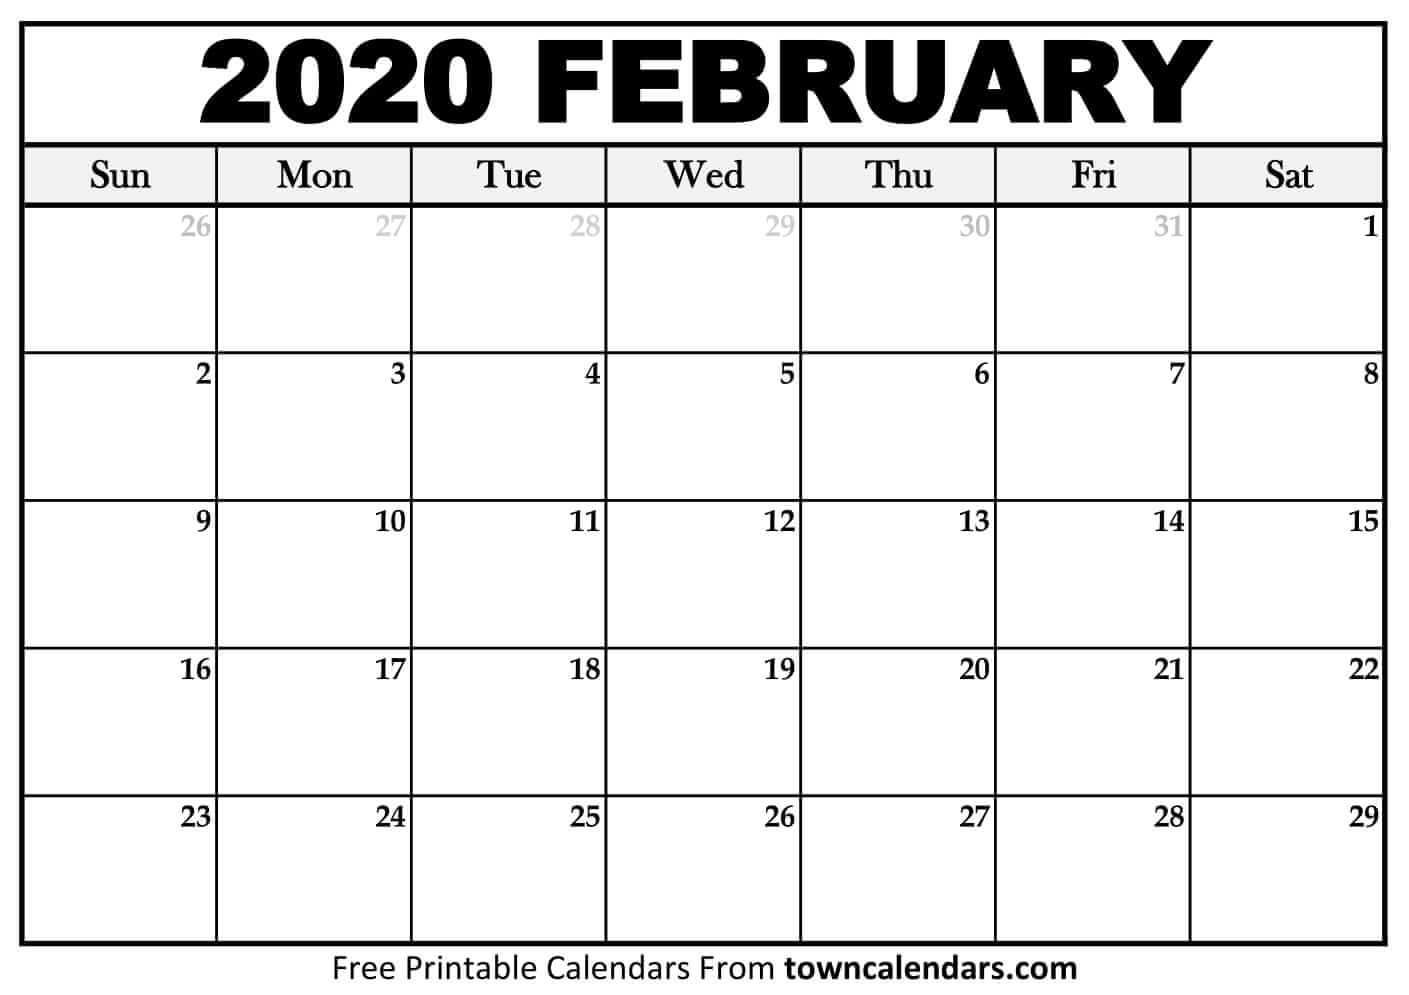 Printable February 2020 Calendar  Towncalendars for Feb 2020 Calendar